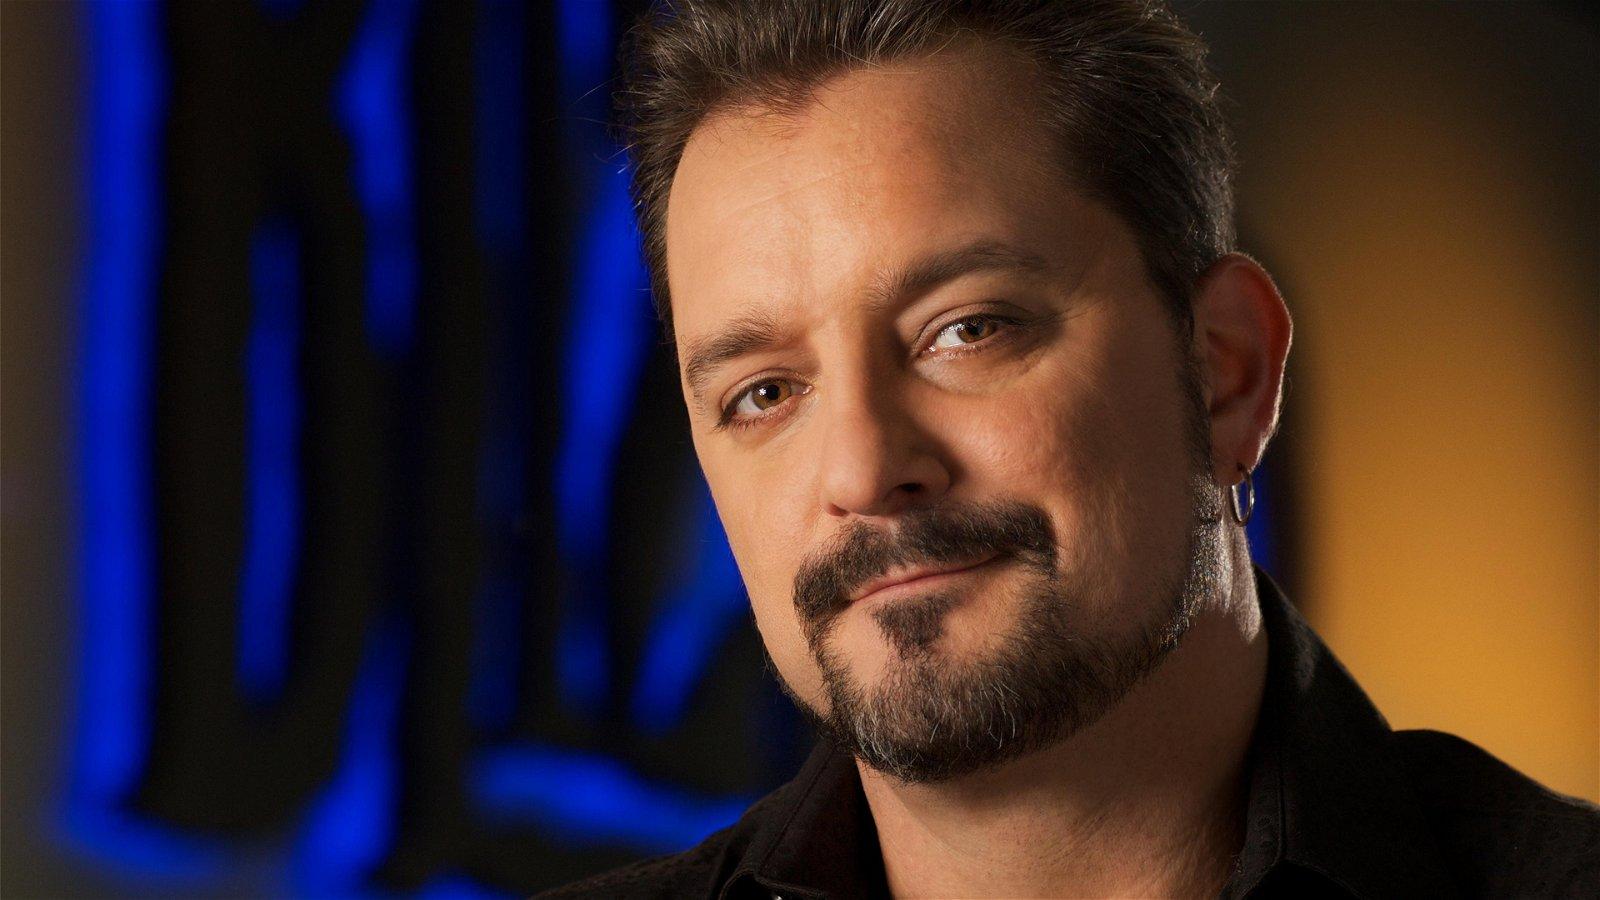 Blizzard Veteran Chris Metzen Announces Retirement 1